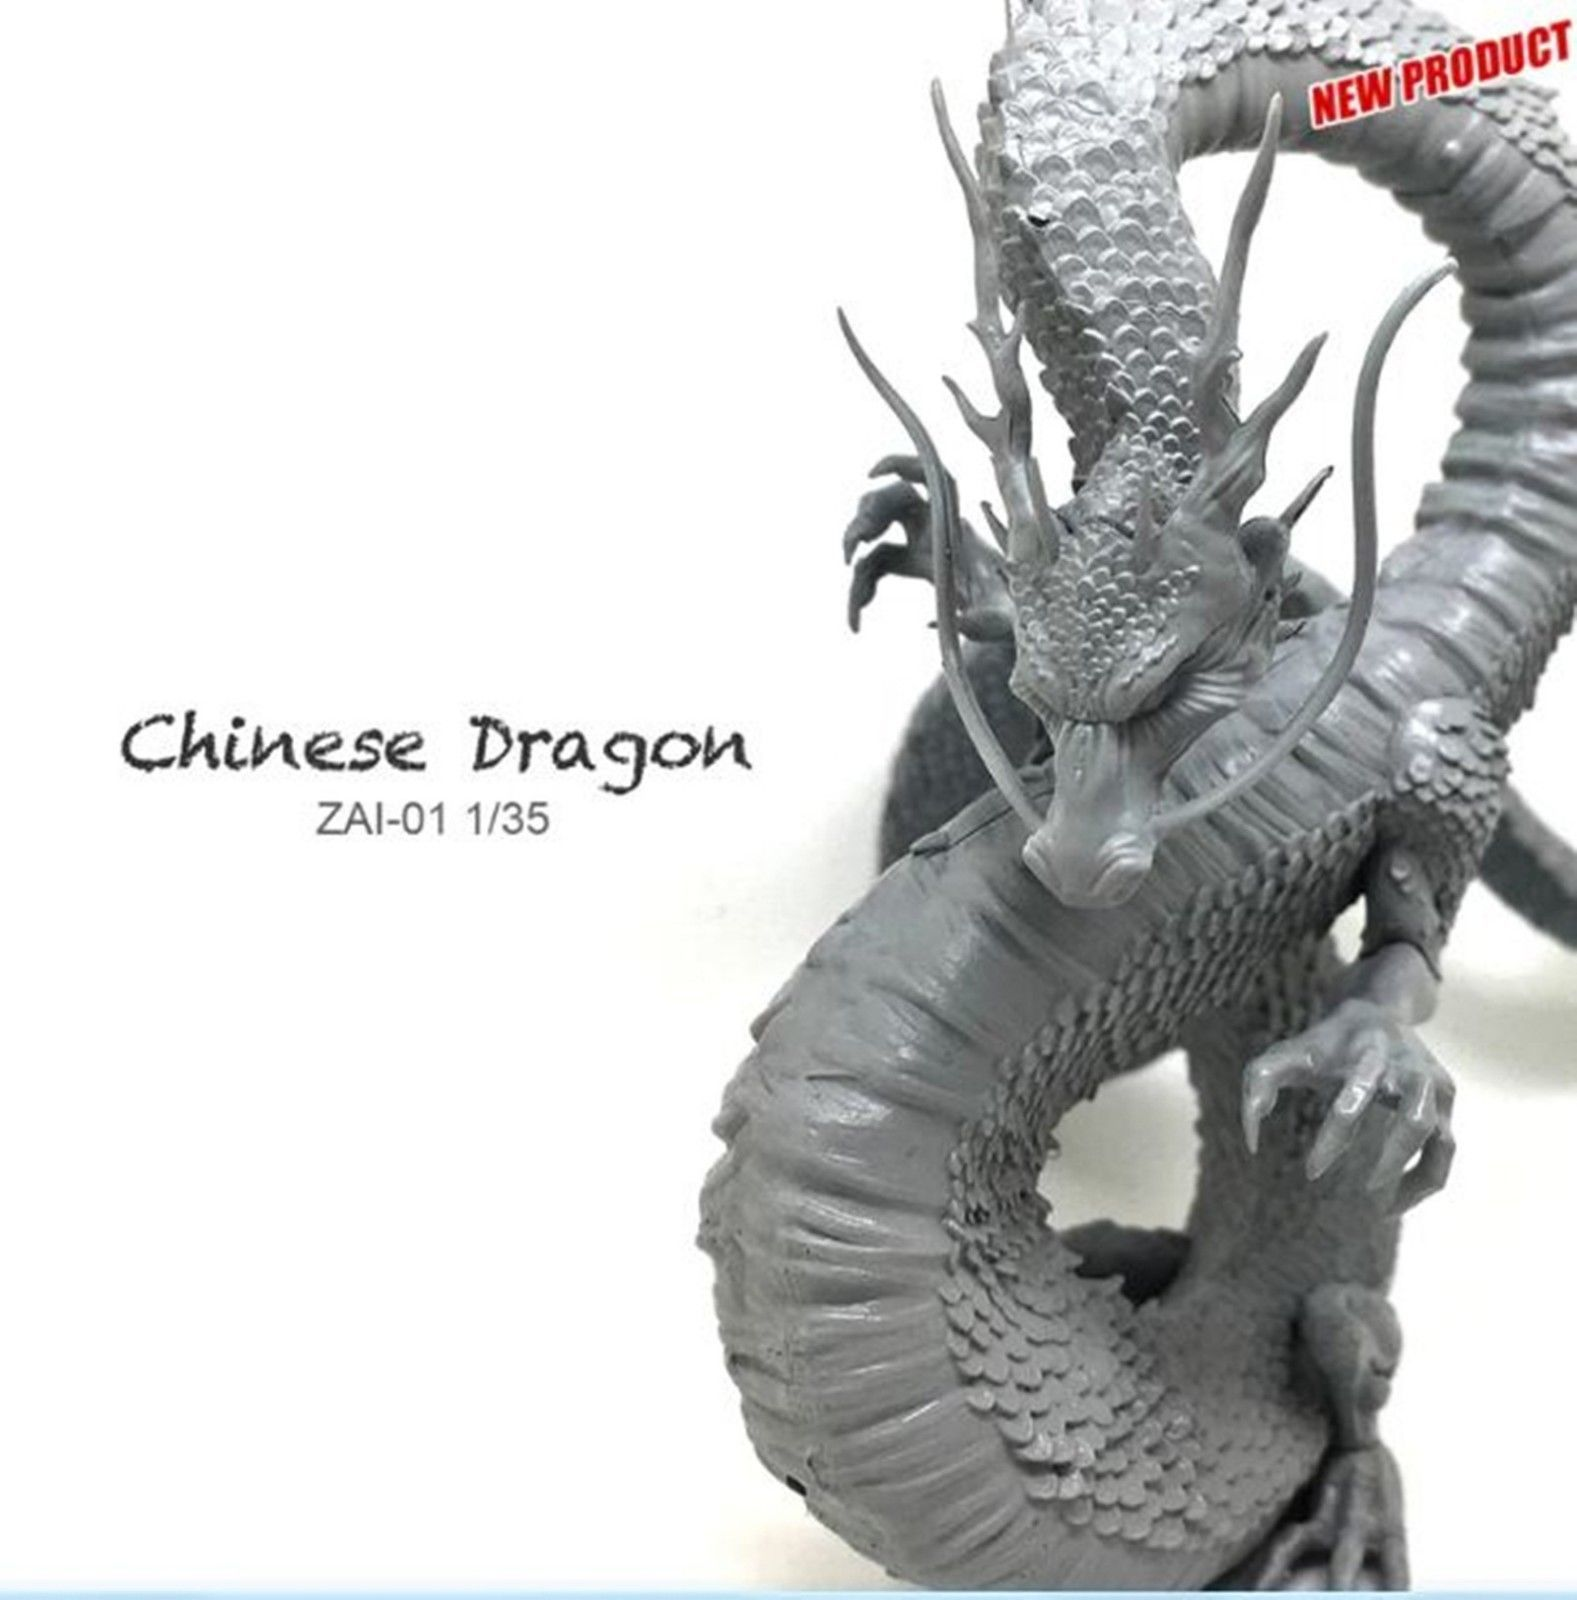 Miniature 1/35 Resin Model Loong Chinese Dragon 90mm Dragon Figure Kit ZAI-01